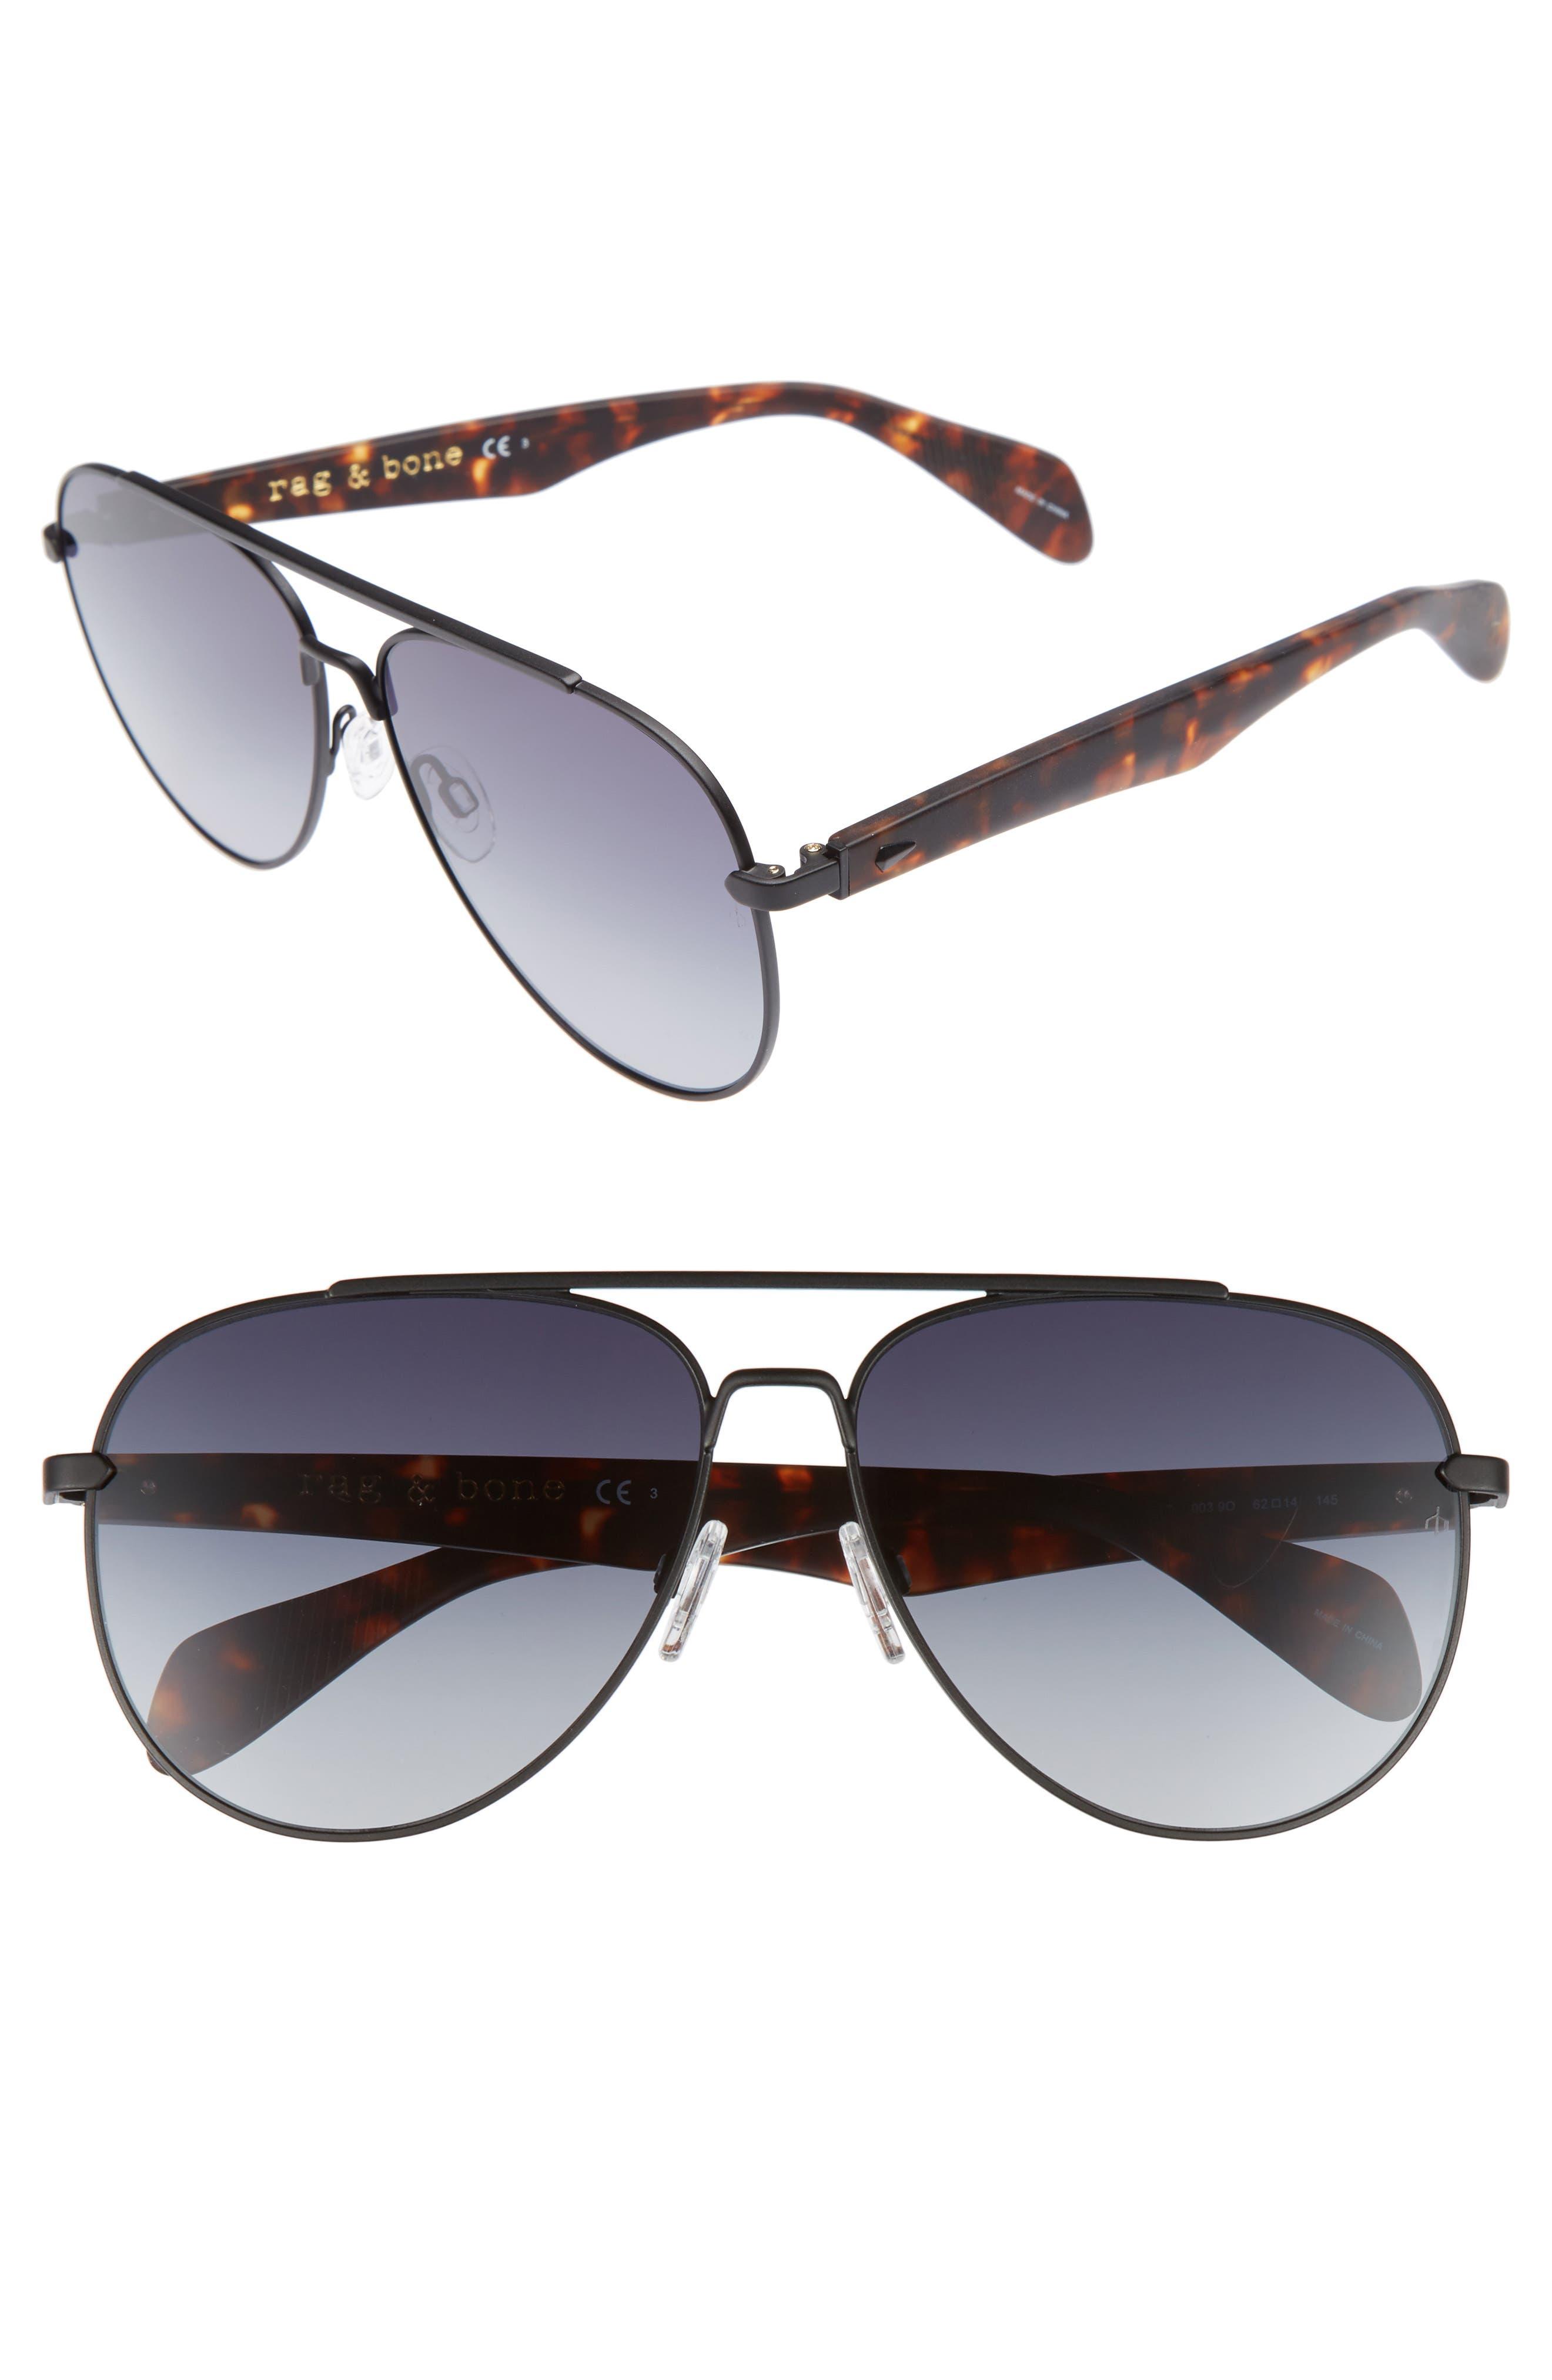 62mm Aviator Sunglasses,                             Main thumbnail 1, color,                             Matte Black